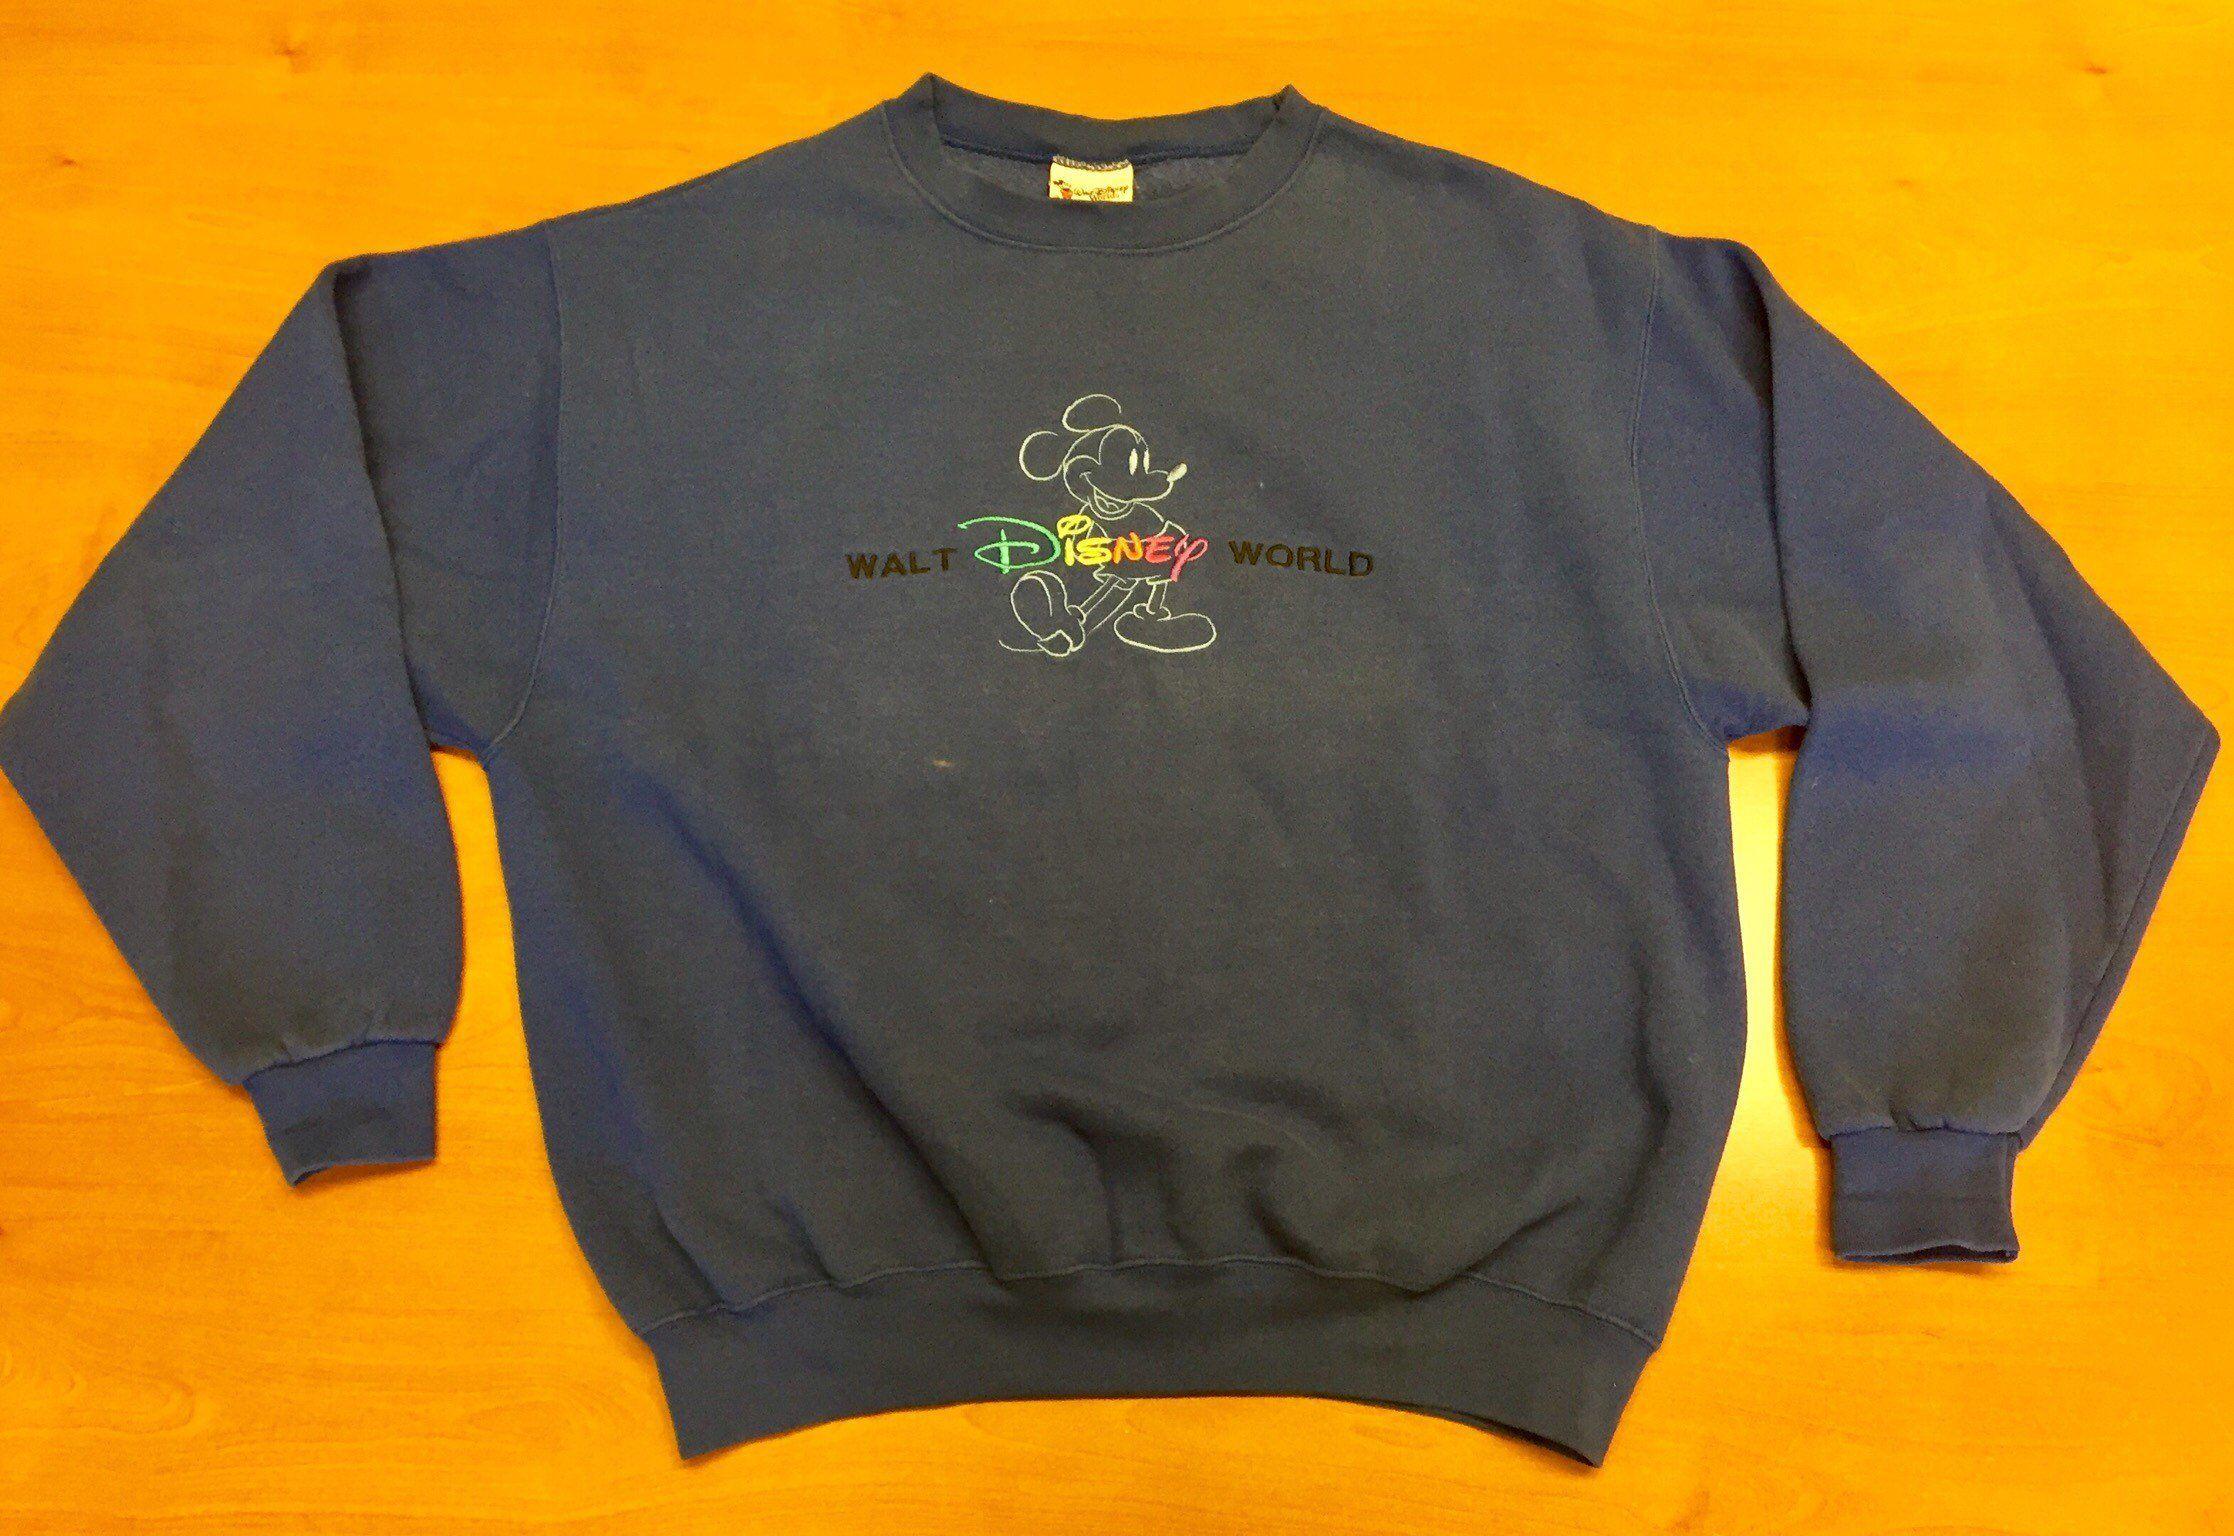 Vintage 1990s Walt Disney World Crewneck Sweatshirt t-shirt minnie donald  duck goofy pluto snow ed04d6de5